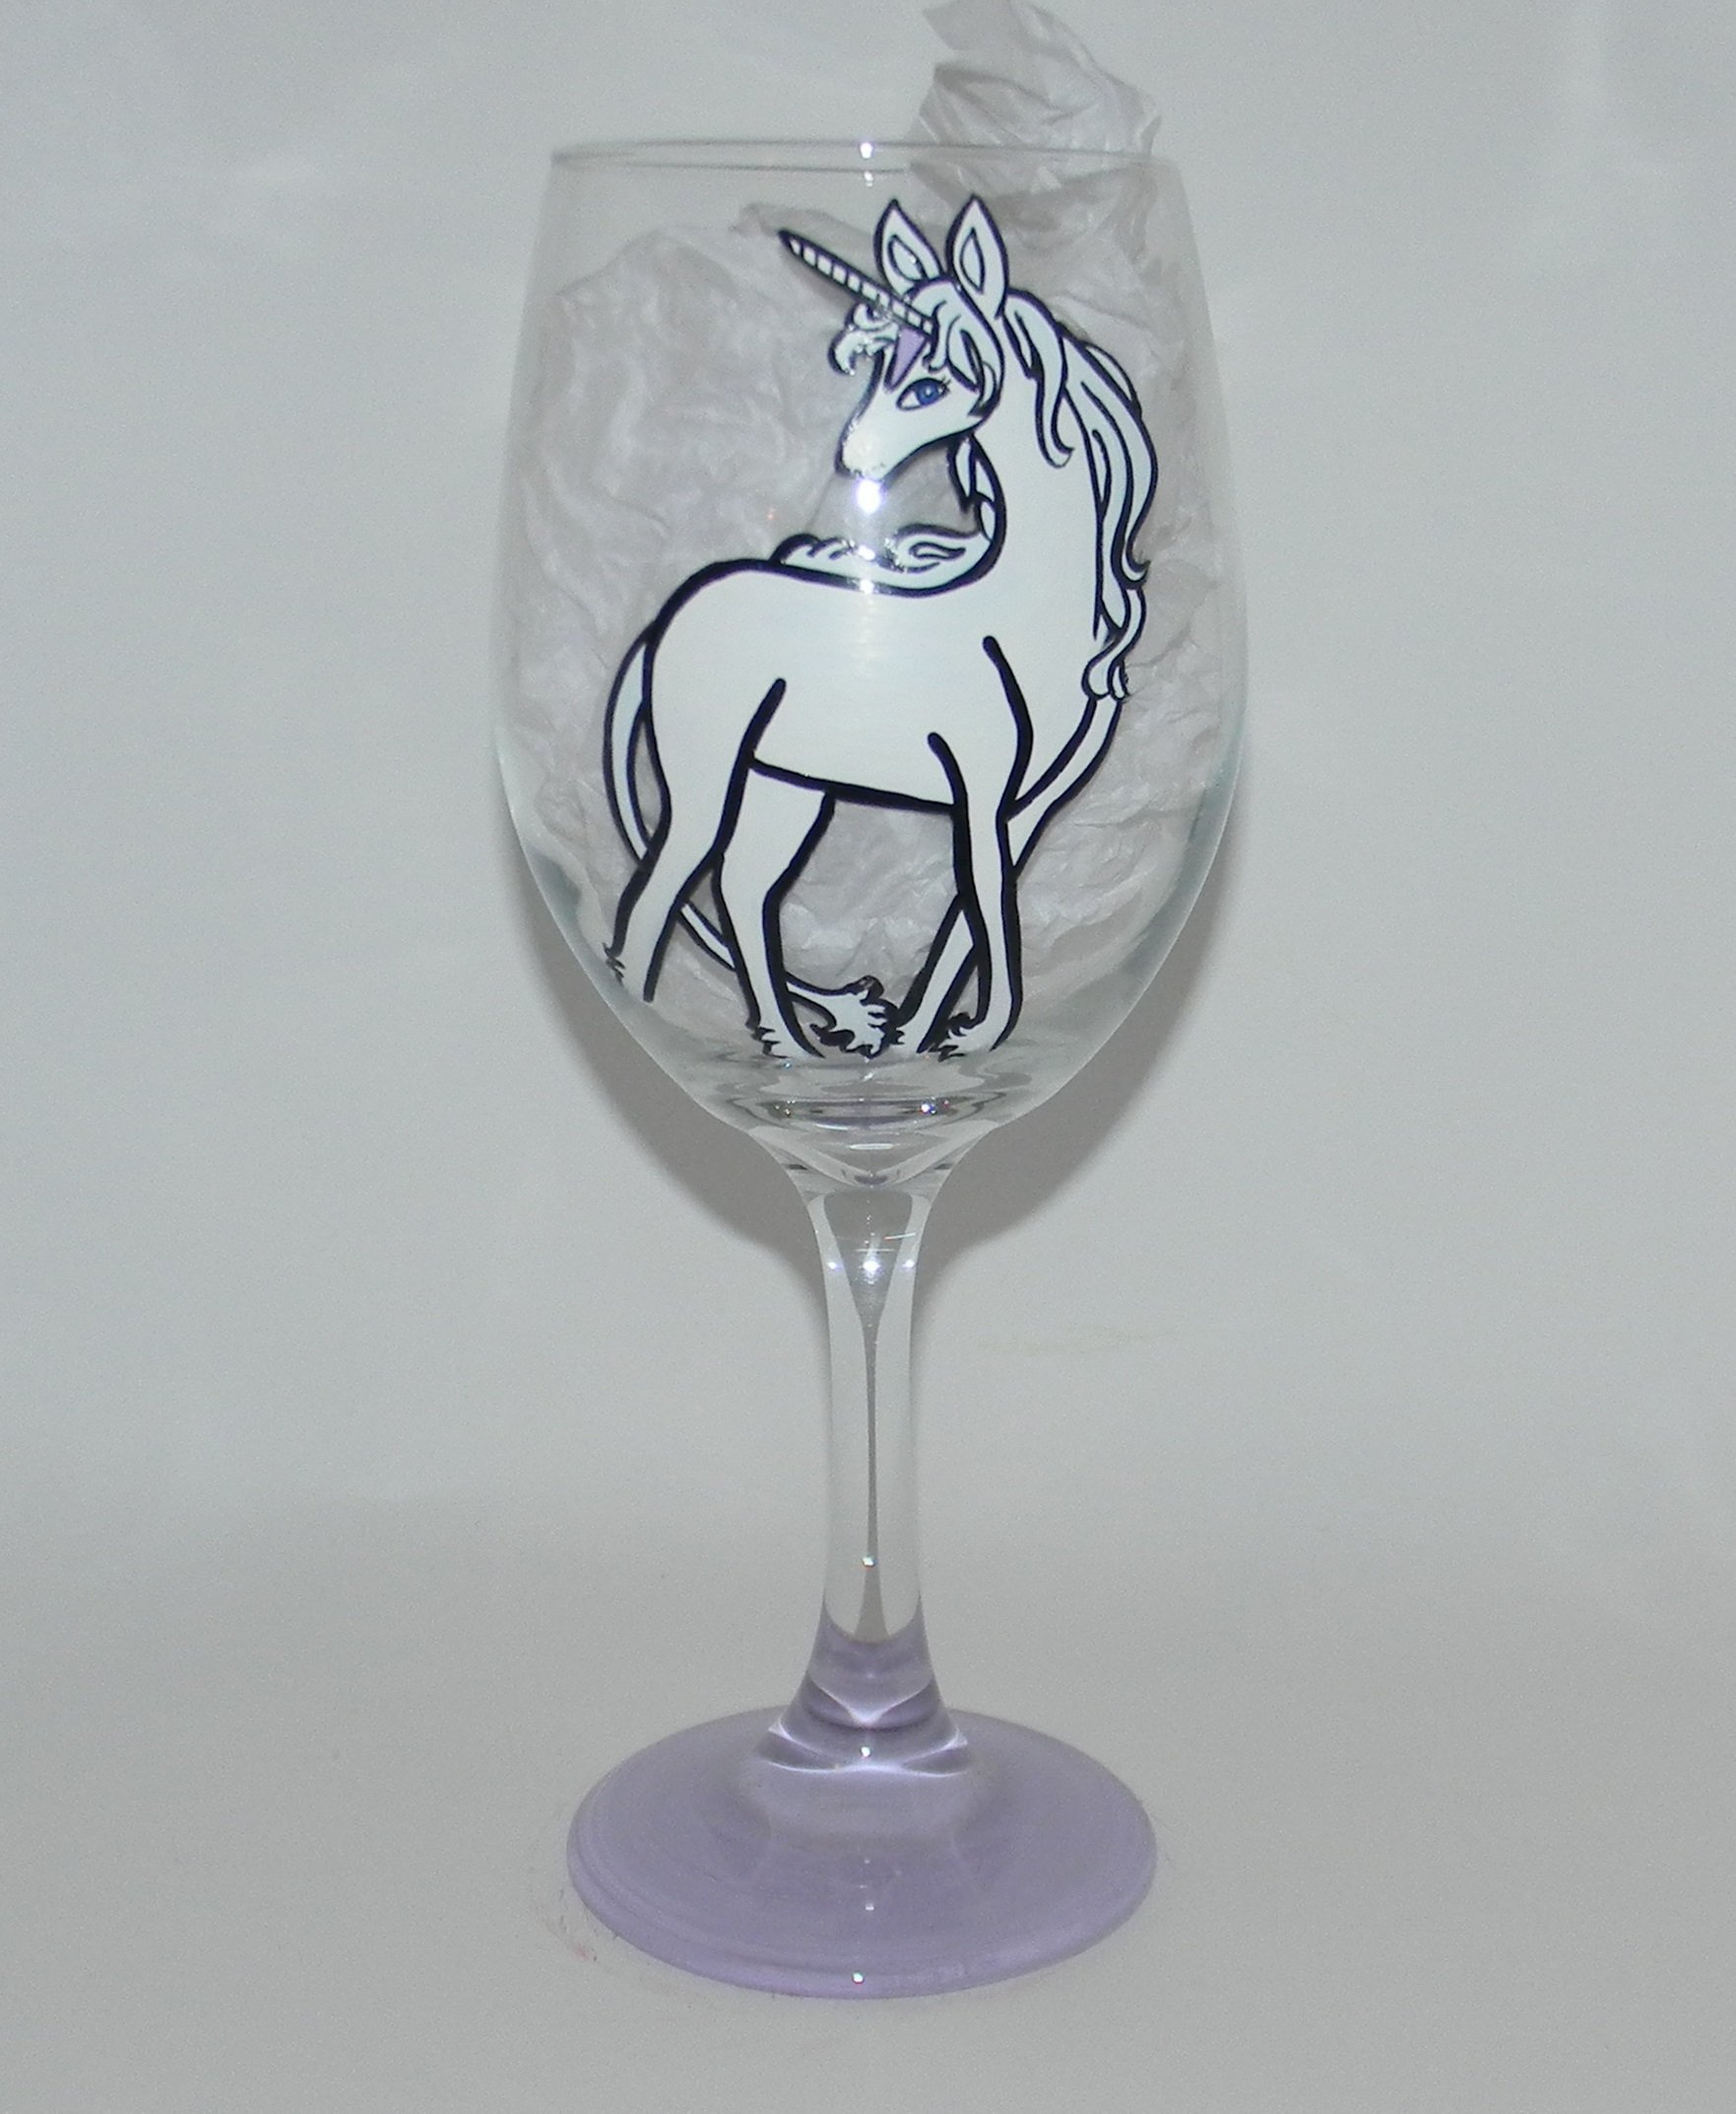 The Last Unicorn wine glass